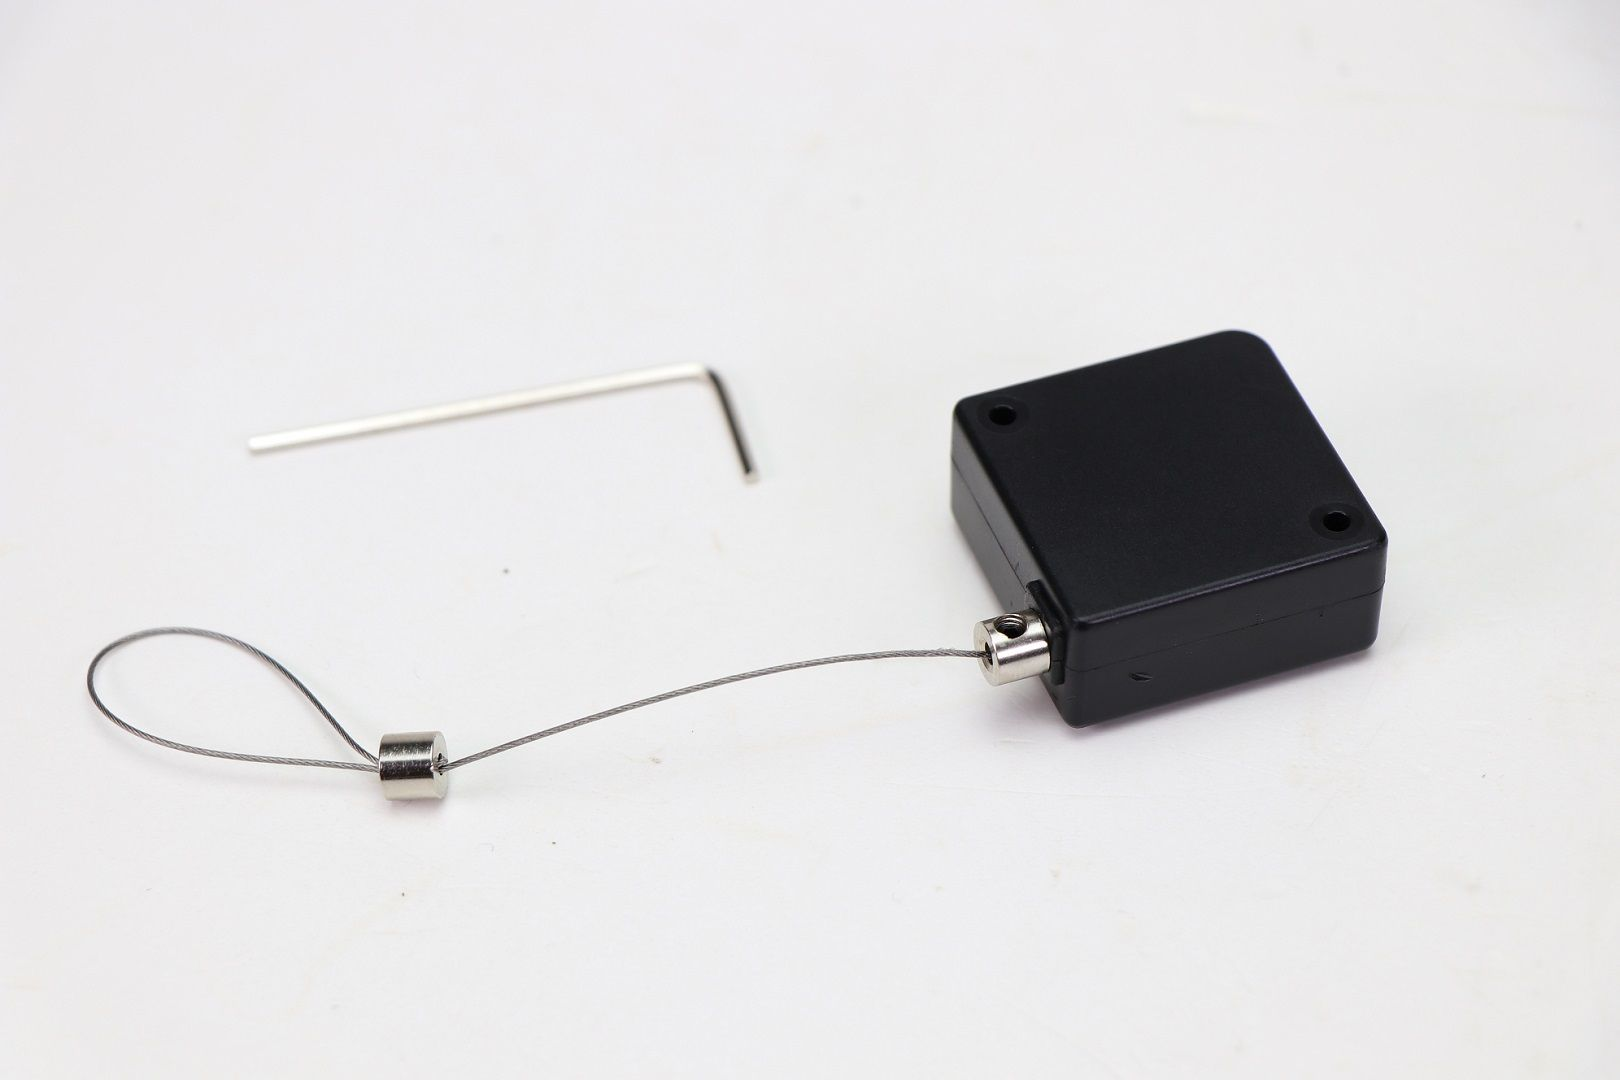 Dispositivo Retrátil antifurto 1m